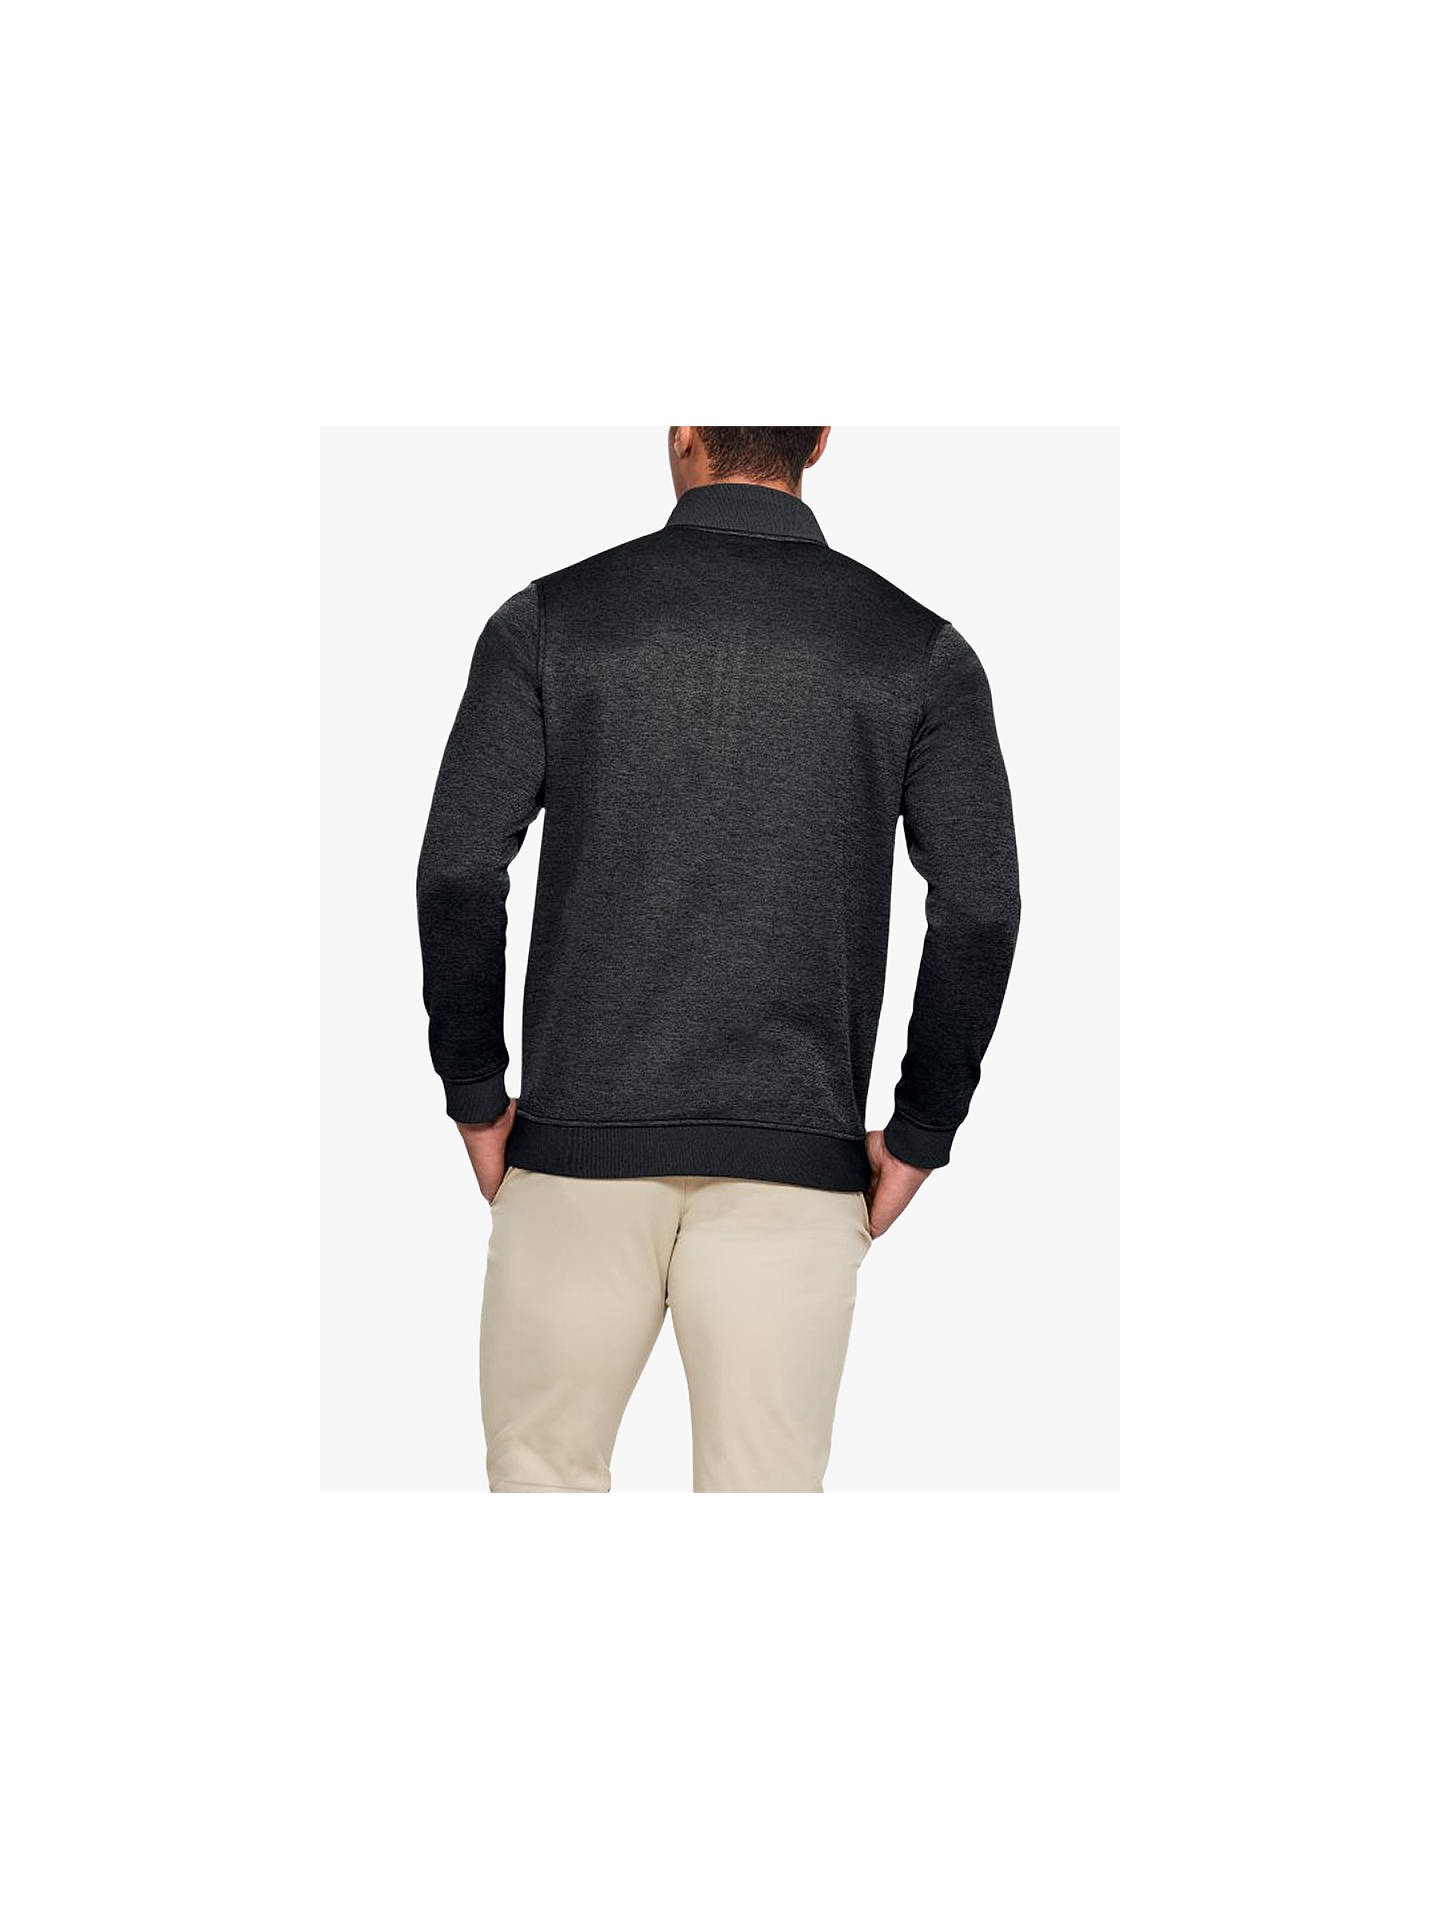 c47b18d613fc Under Armour Storm Sweater Fleece Quarter Zip Top at John Lewis ...